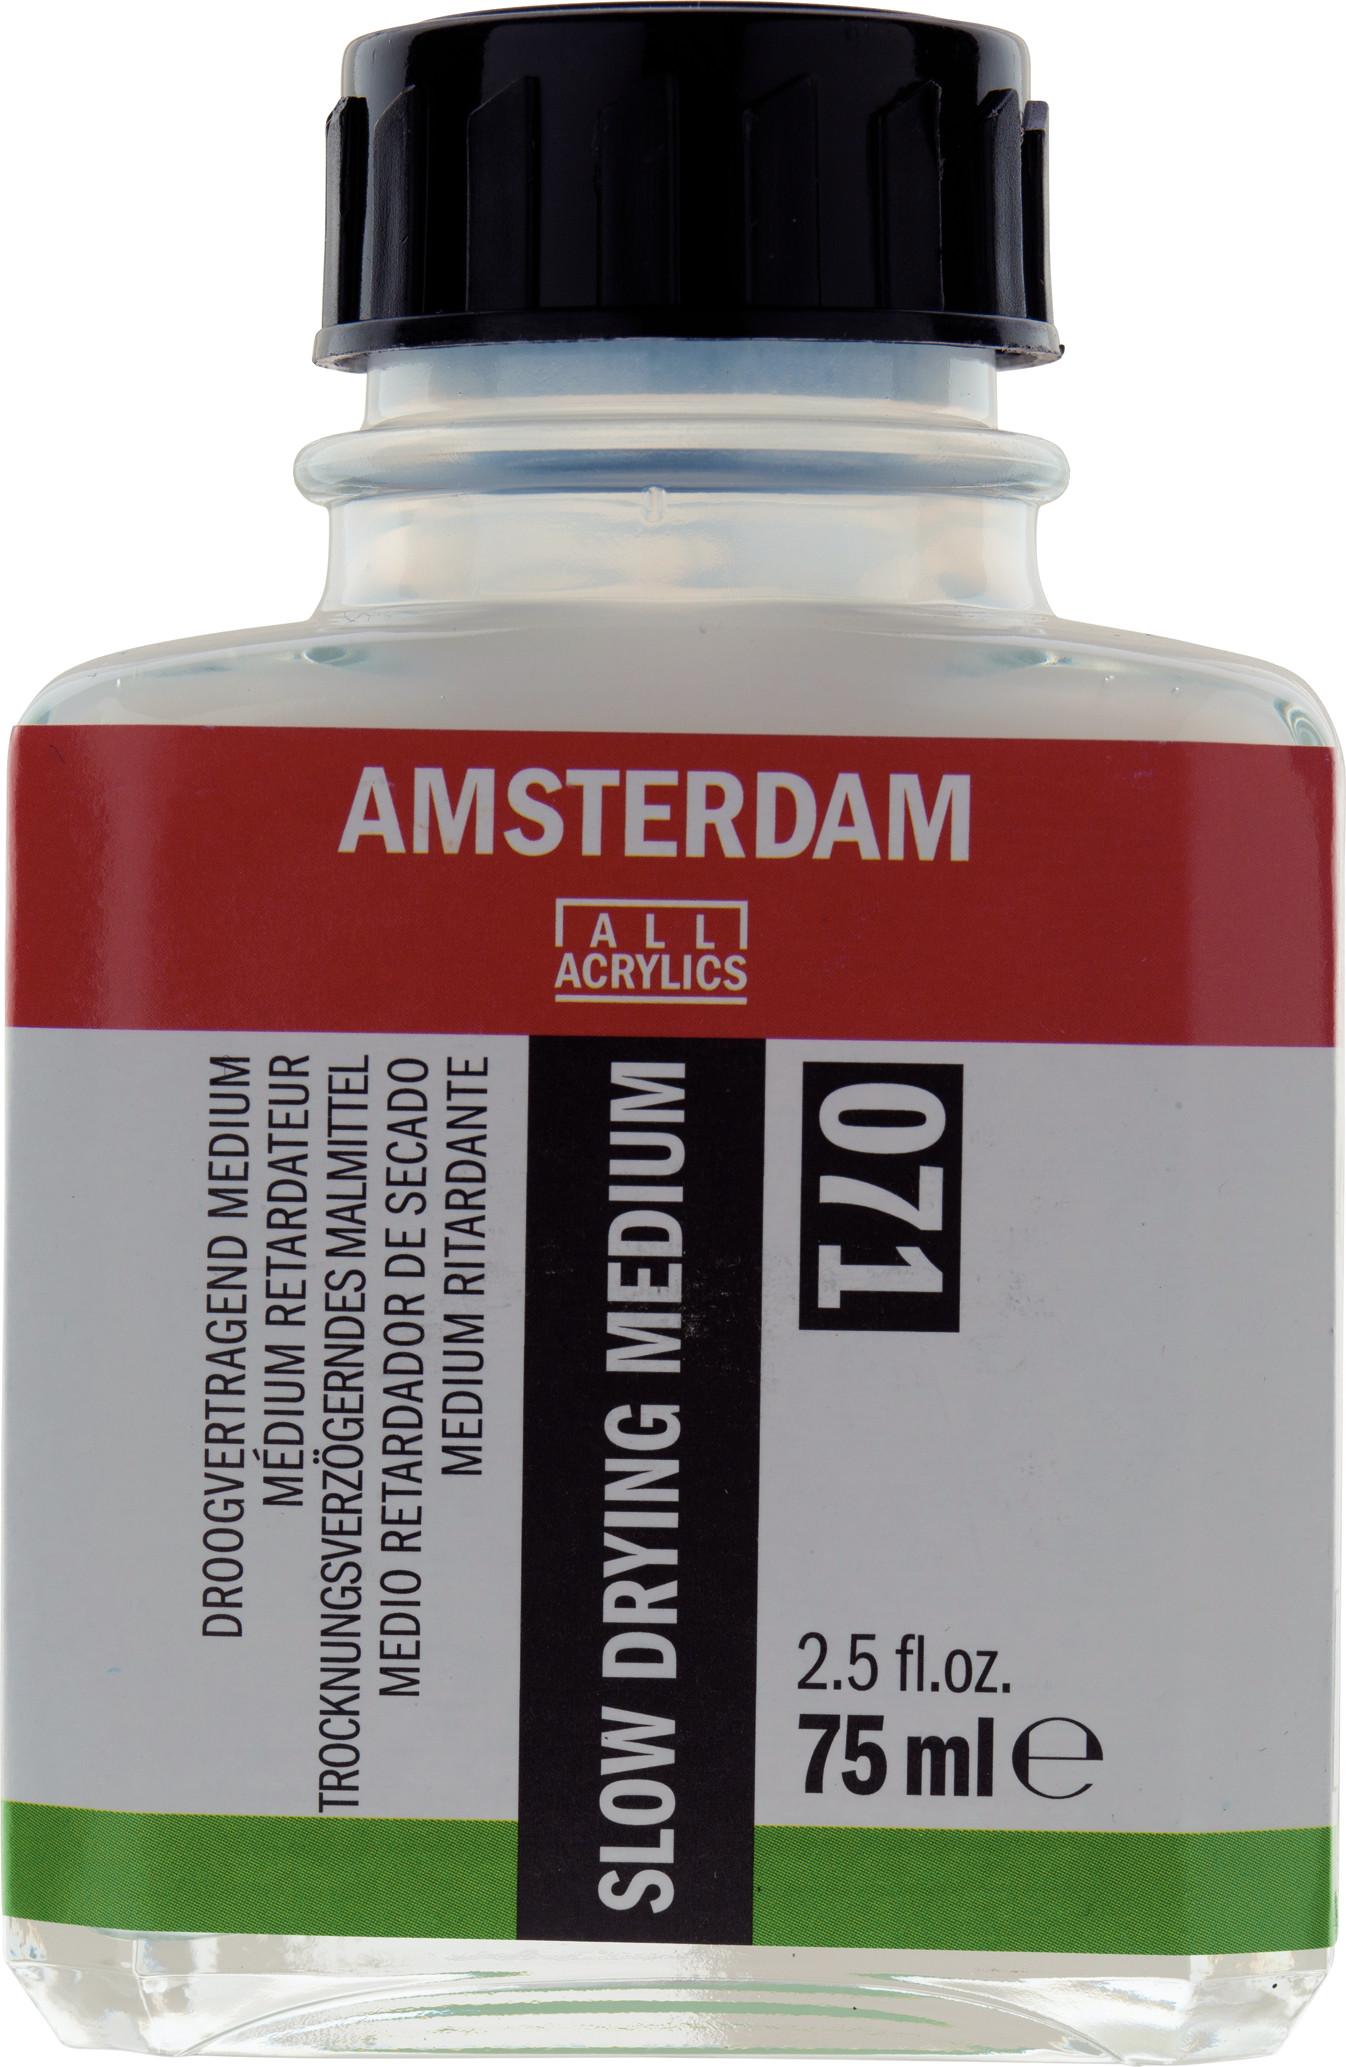 Amsterdam Slow Drying Medium Bottle 75 ml